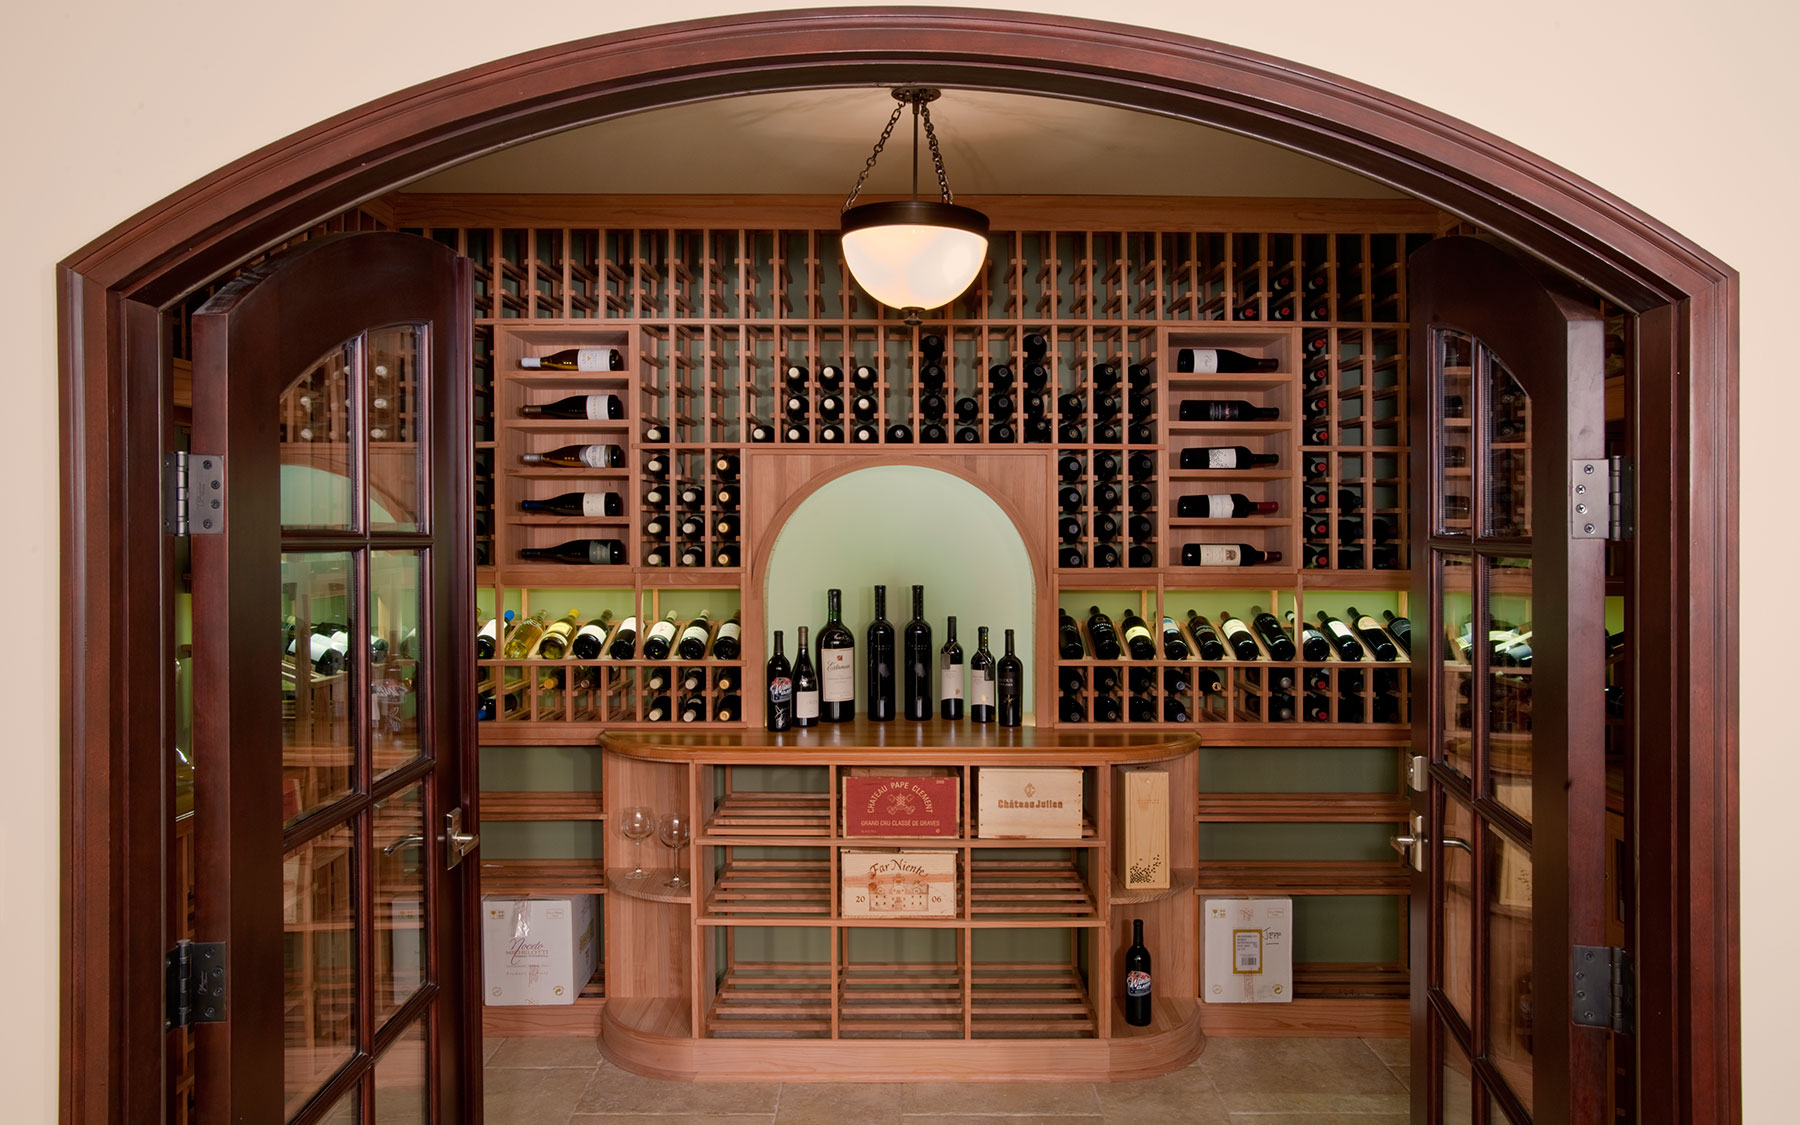 Graceful Wine Cellar Doors Ontario Wine Cellar Doors Dallas Tx Custom Interior Arched Clear Glass Winecellar Interior Solid Mahogany Wood Bevel houzz 01 Wine Cellar Doors